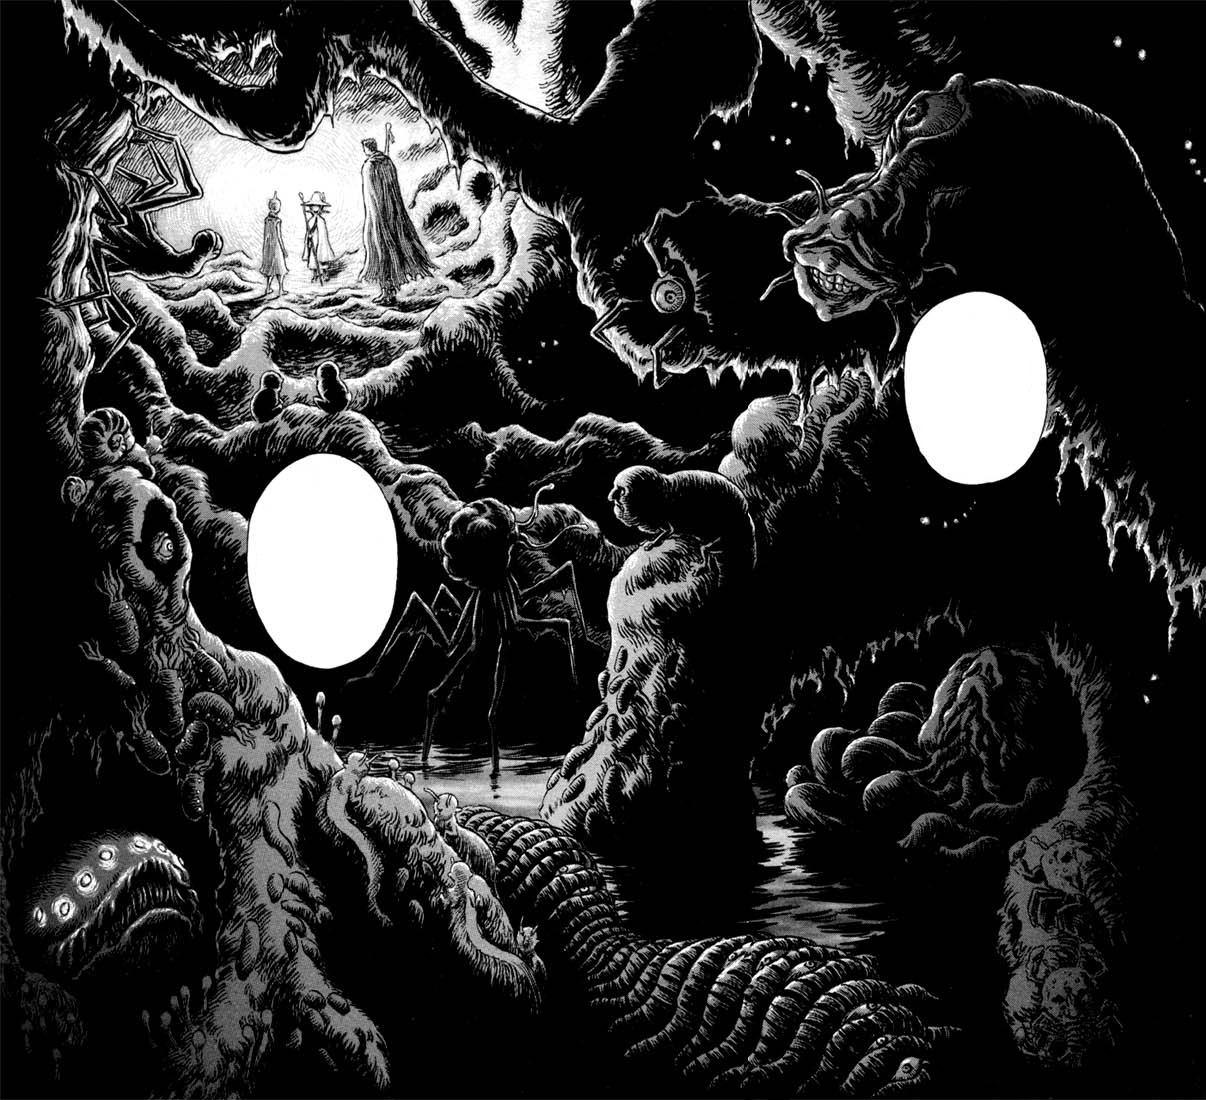 Qliphoth - Berserk Wiki - Berserk Manga and Anime